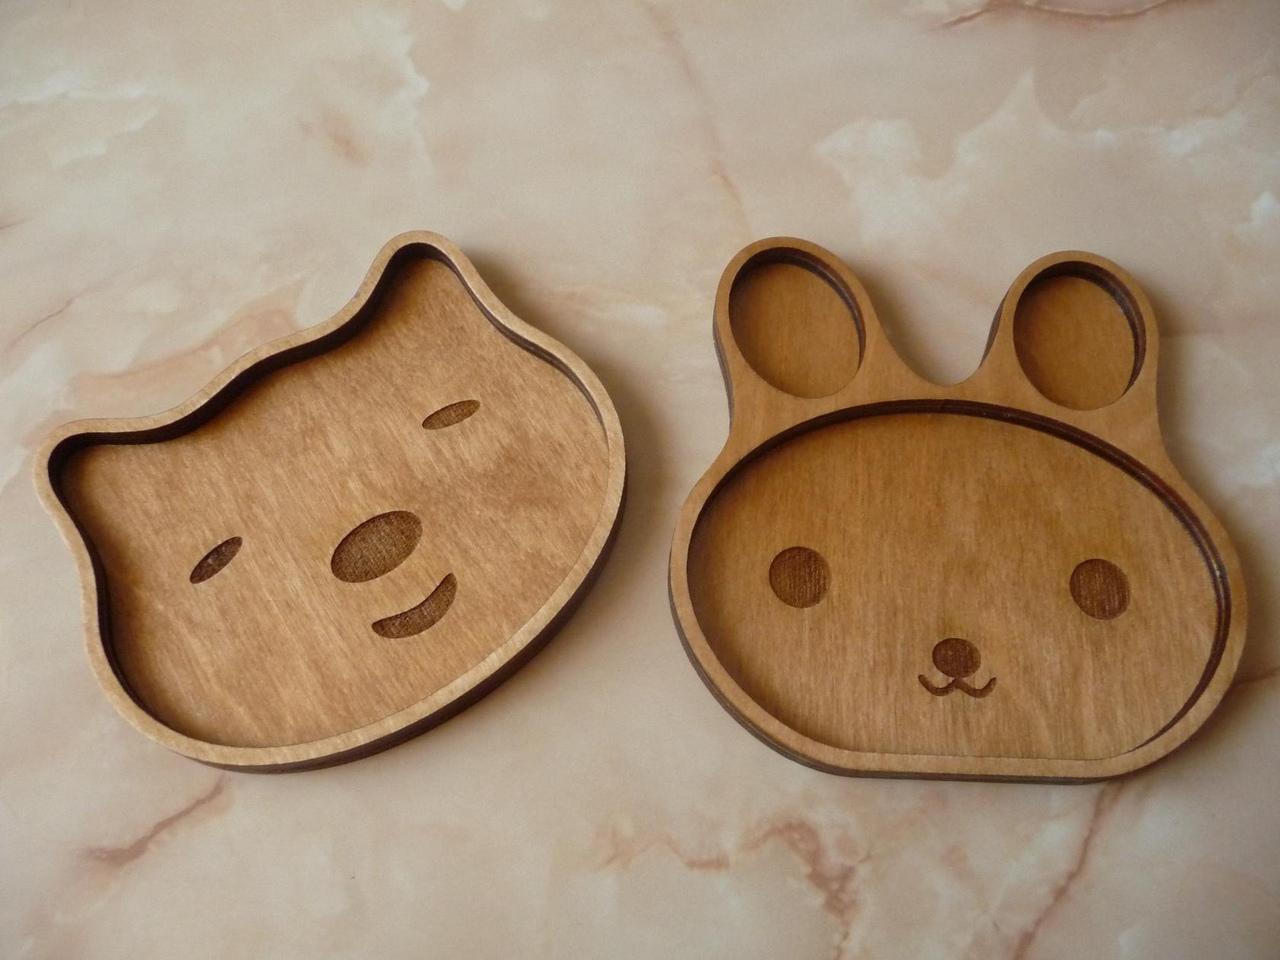 Children's Plates Laser Engraved Free Vector